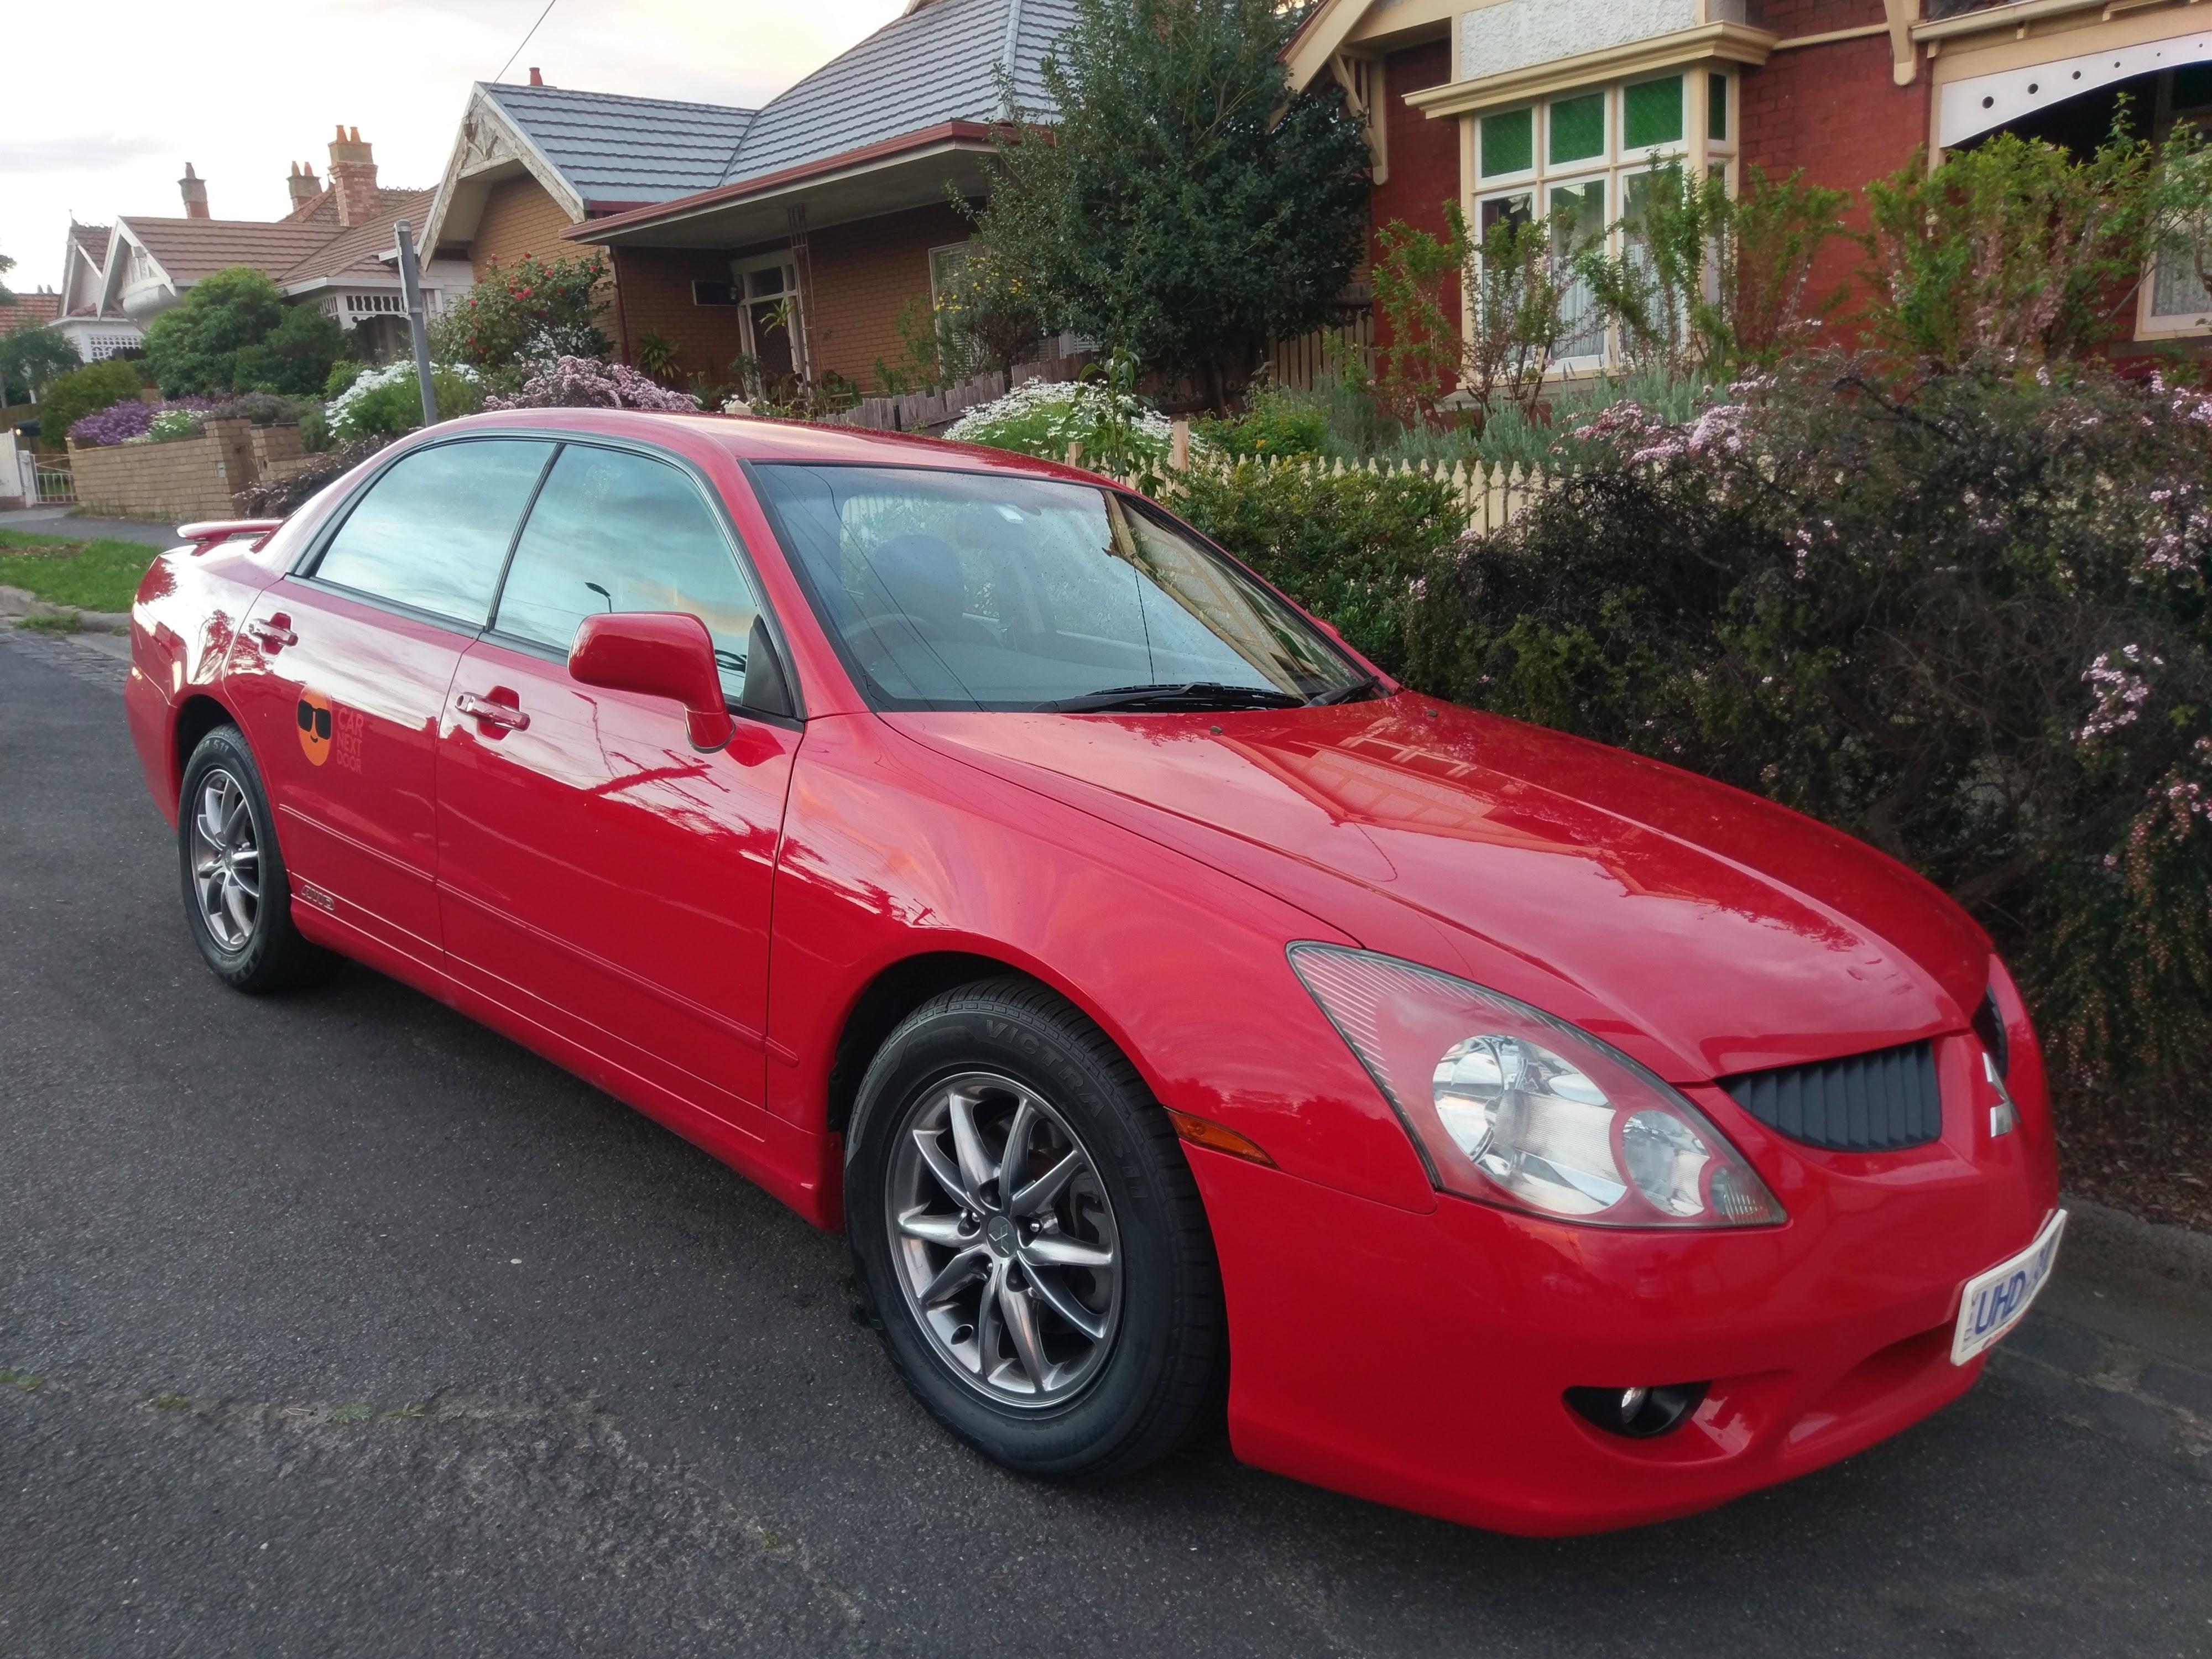 Picture of Matthew's 2004 Mitsubishi Magna